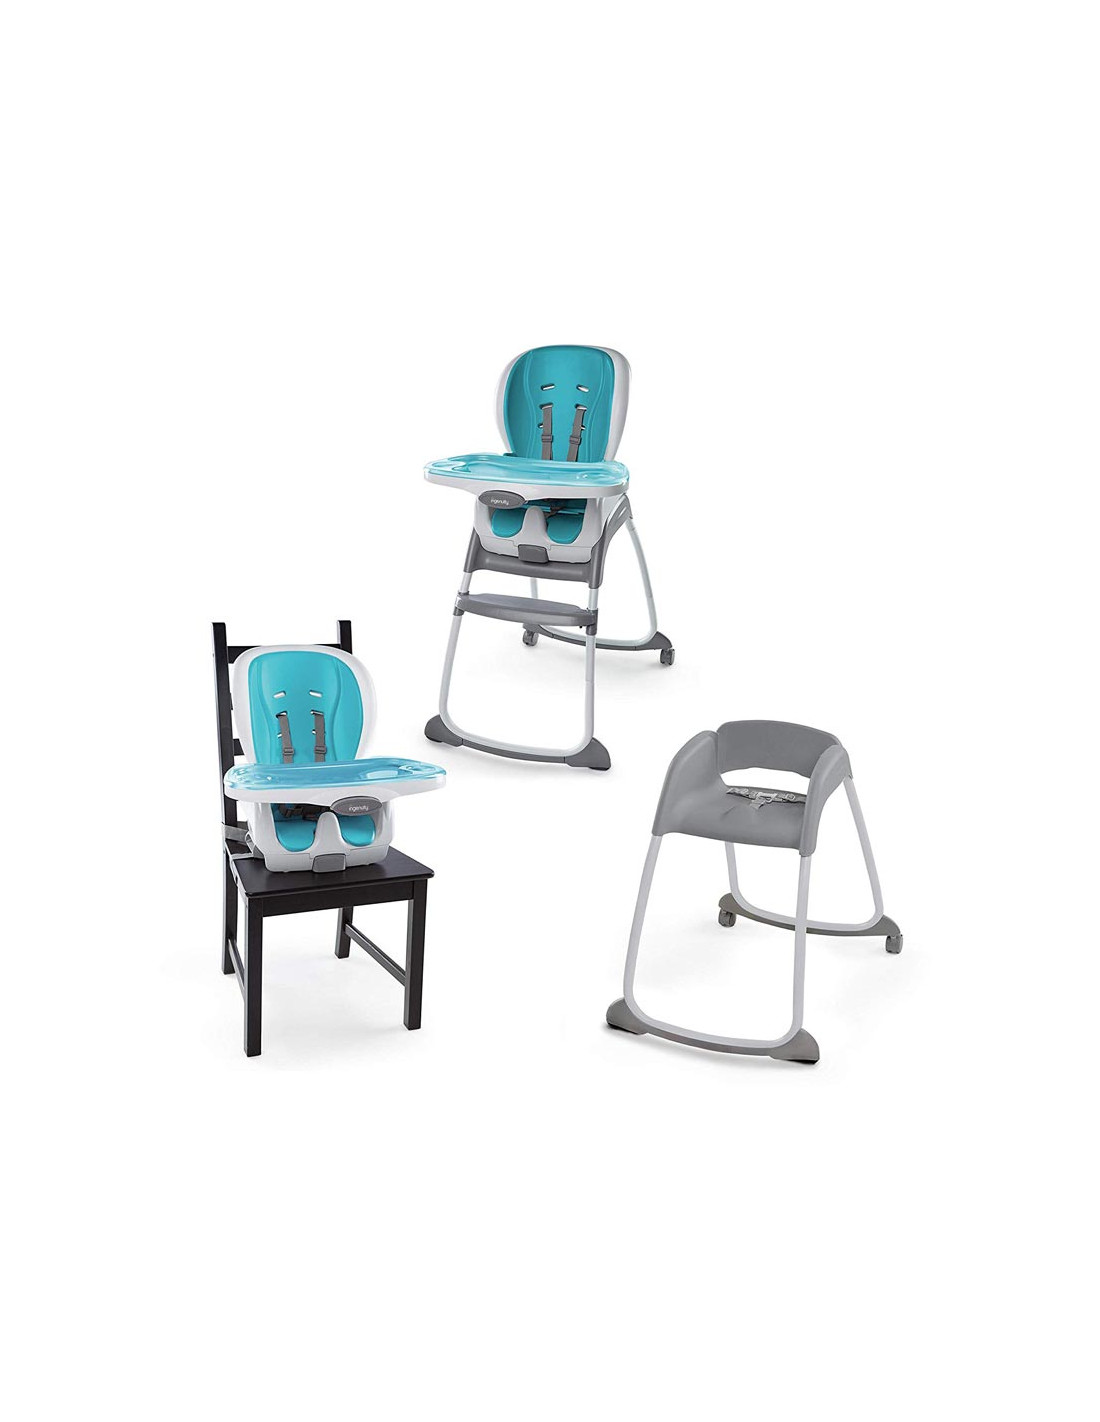 chaise haute 3 en 1 ingenuity eva smartclean. Black Bedroom Furniture Sets. Home Design Ideas